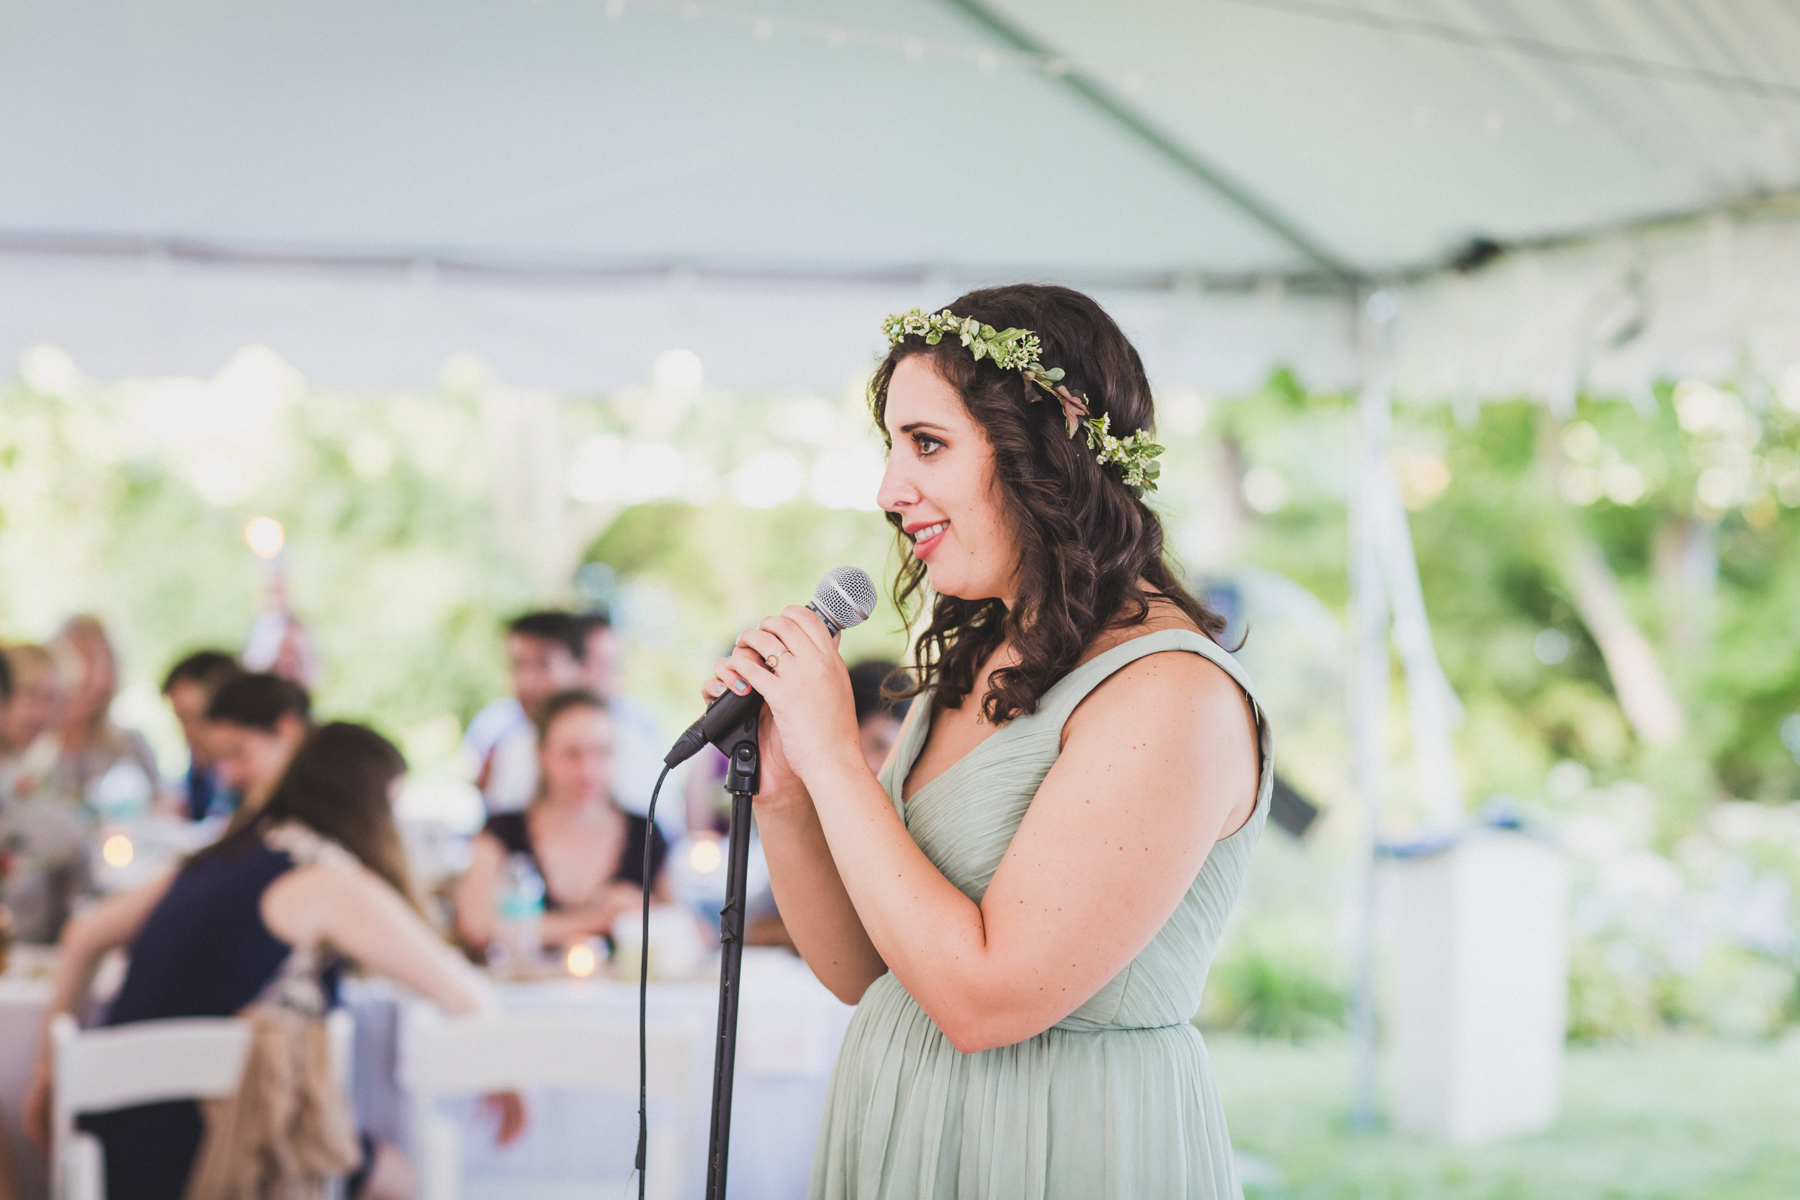 Long-Island-Documentary-Wedding-Photography-Summer-Tent-Wedding-in-New-York-112.jpg